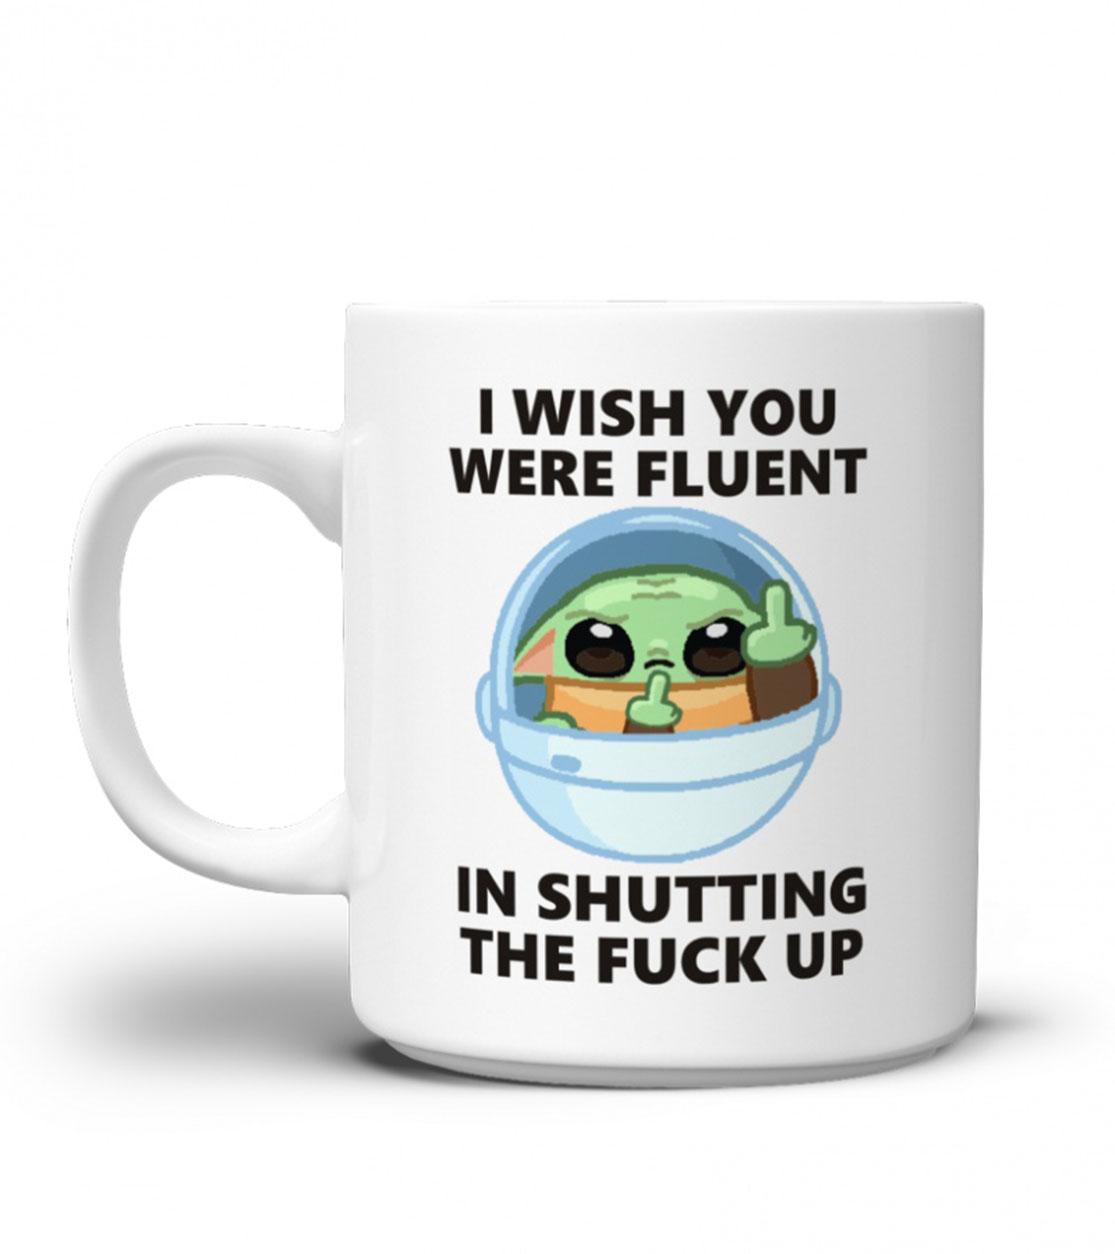 Baby Yoda I wish you were fluent in shutting the fuck up mug